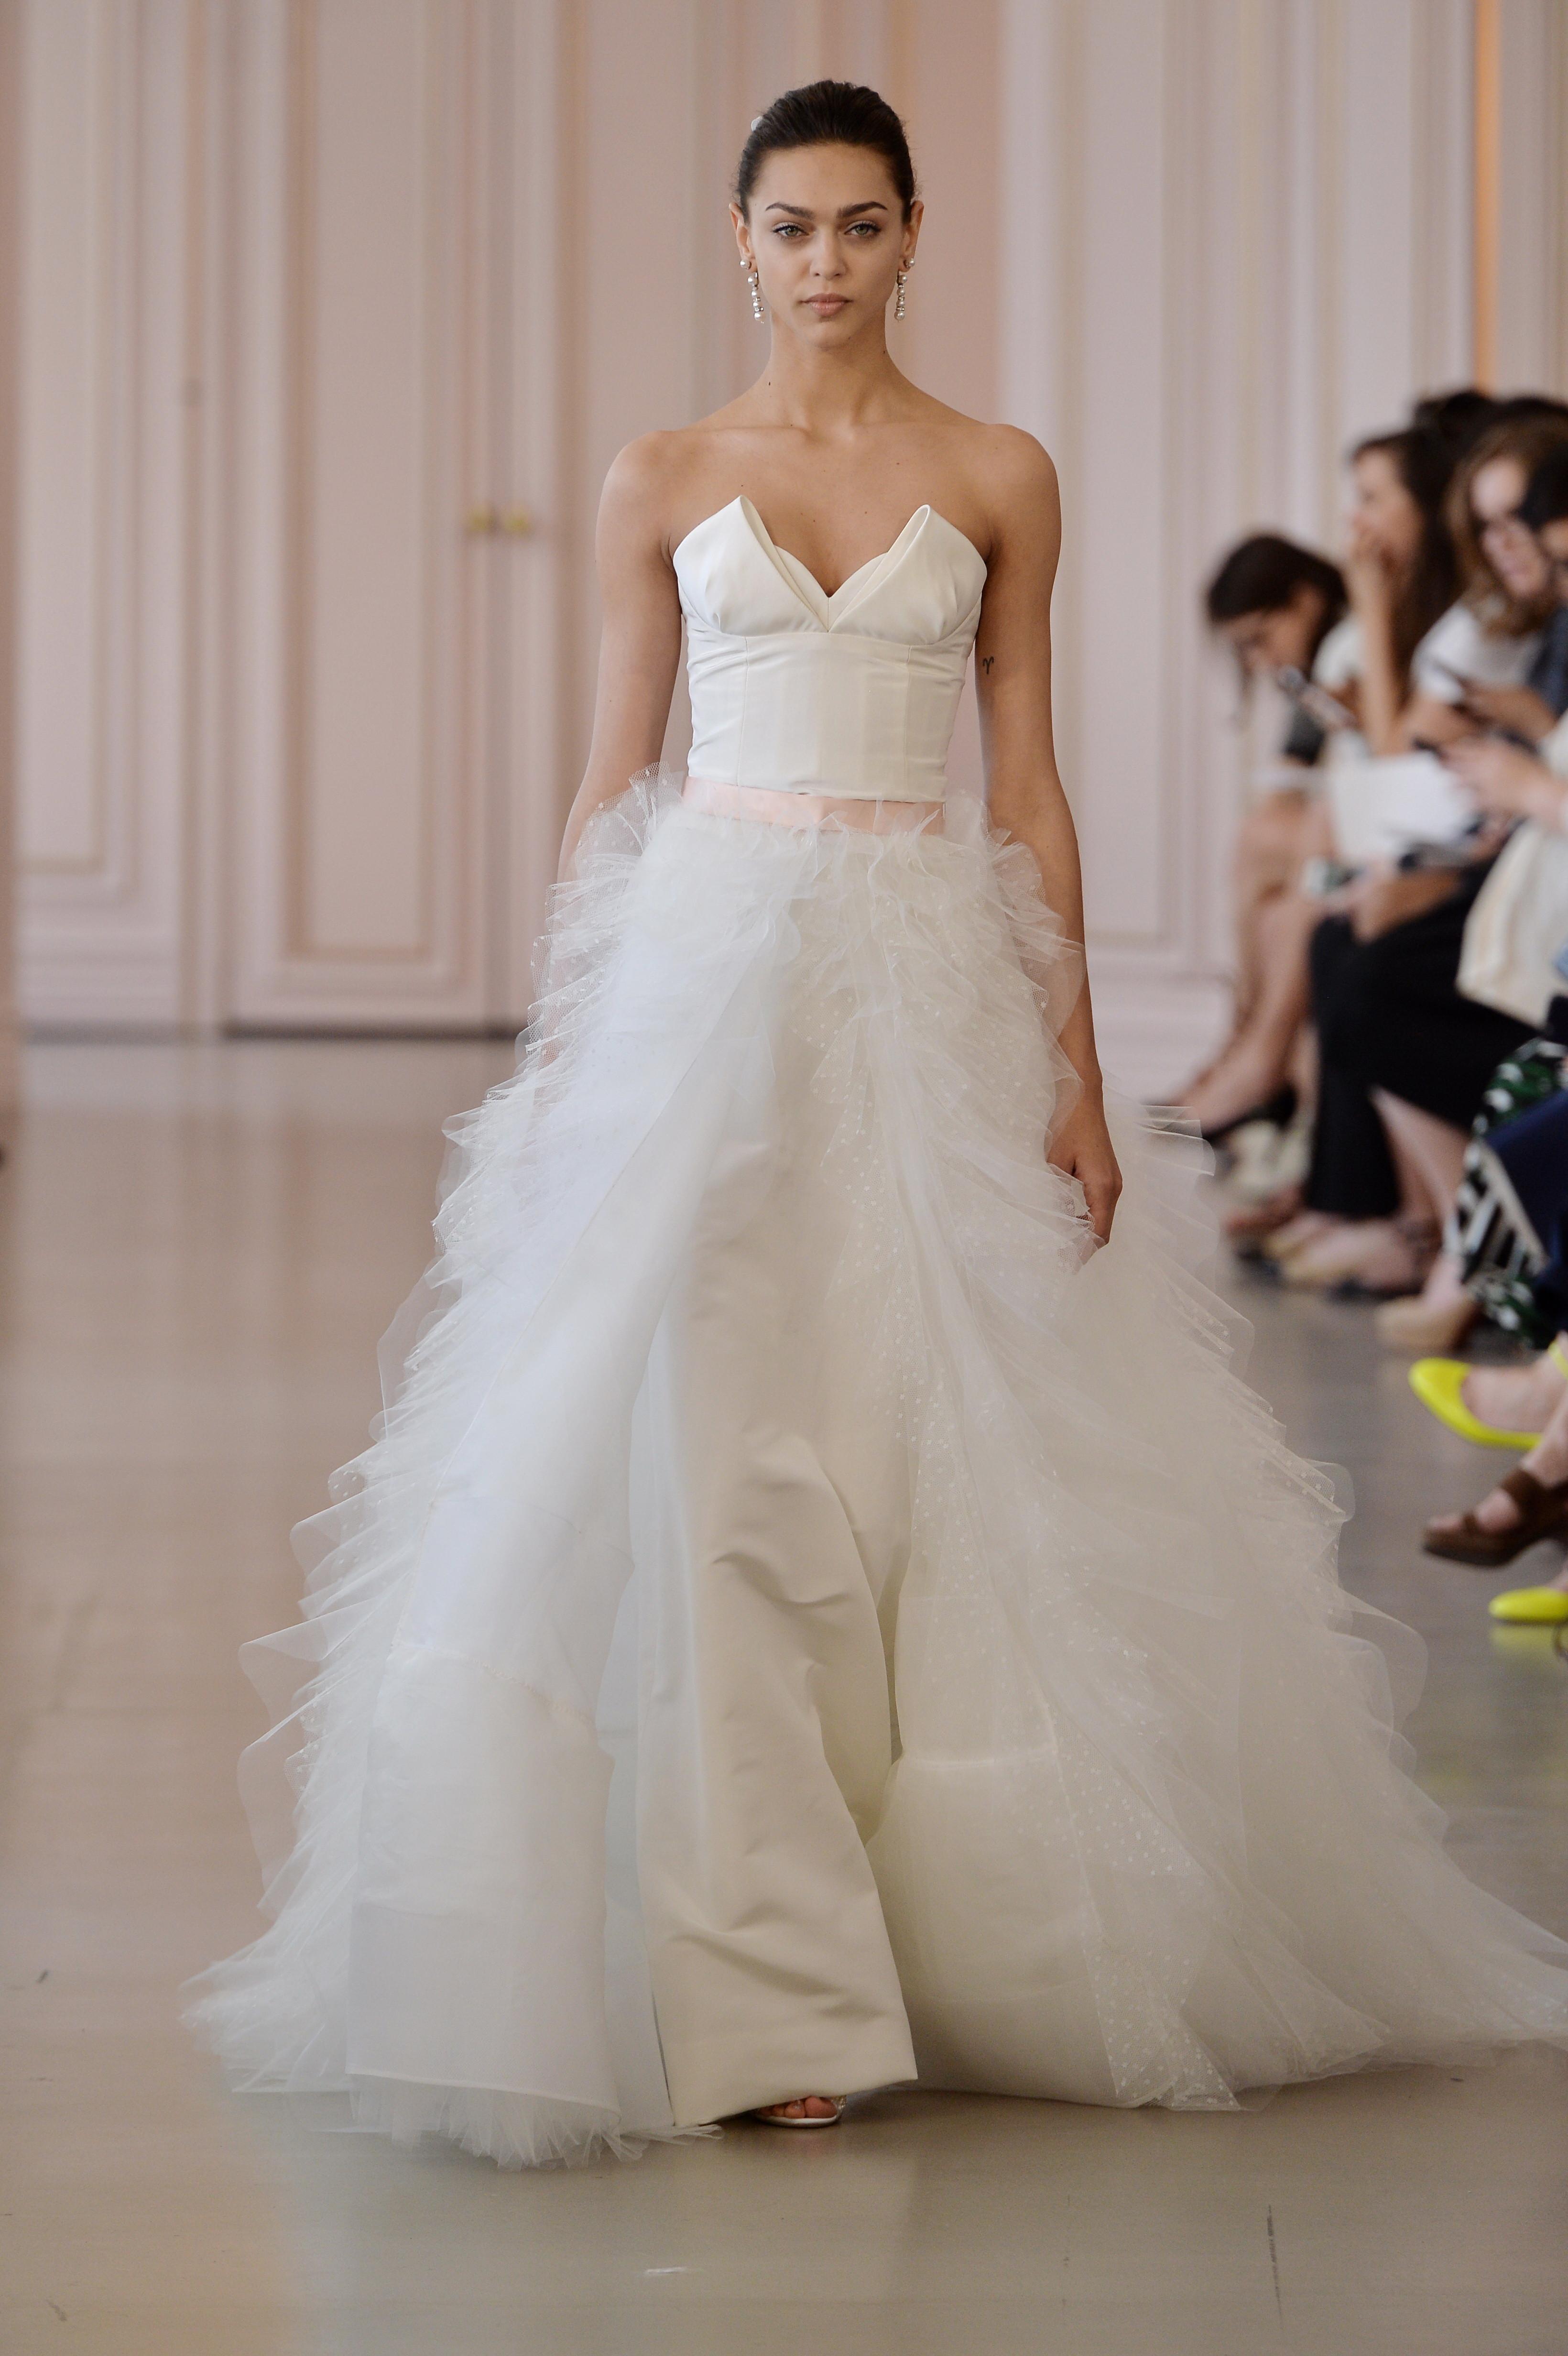 Brautmoden Trends 2016 - shopandmarry